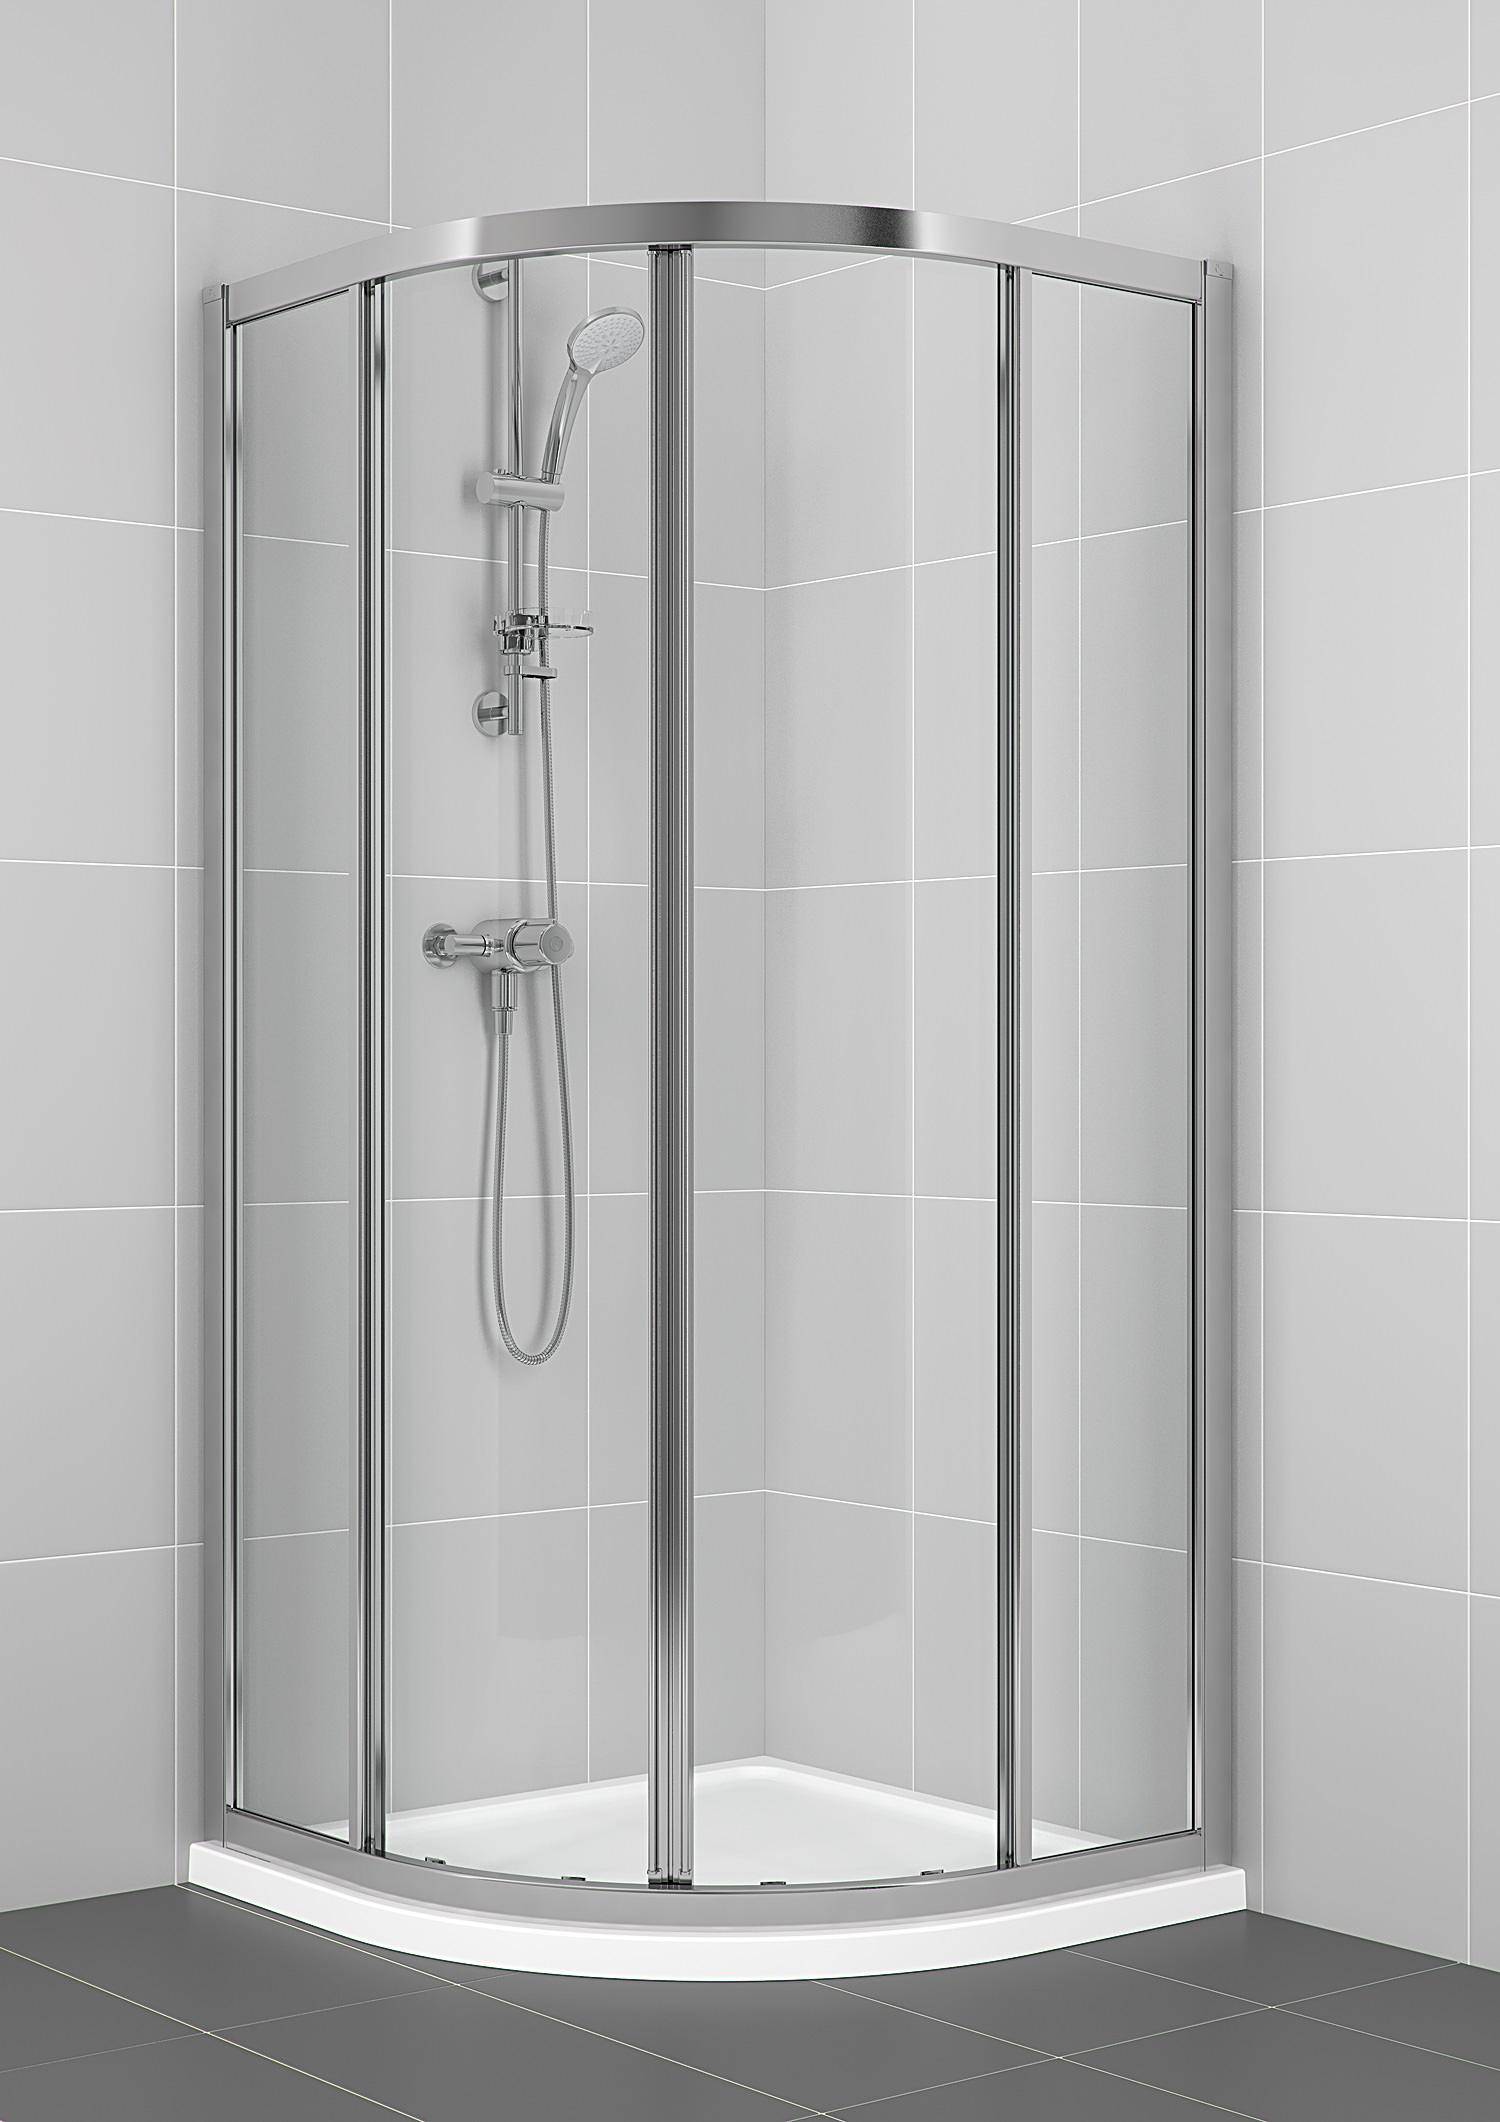 Ideal Standard New Connect 900mm Quadrant Shower Enclosure